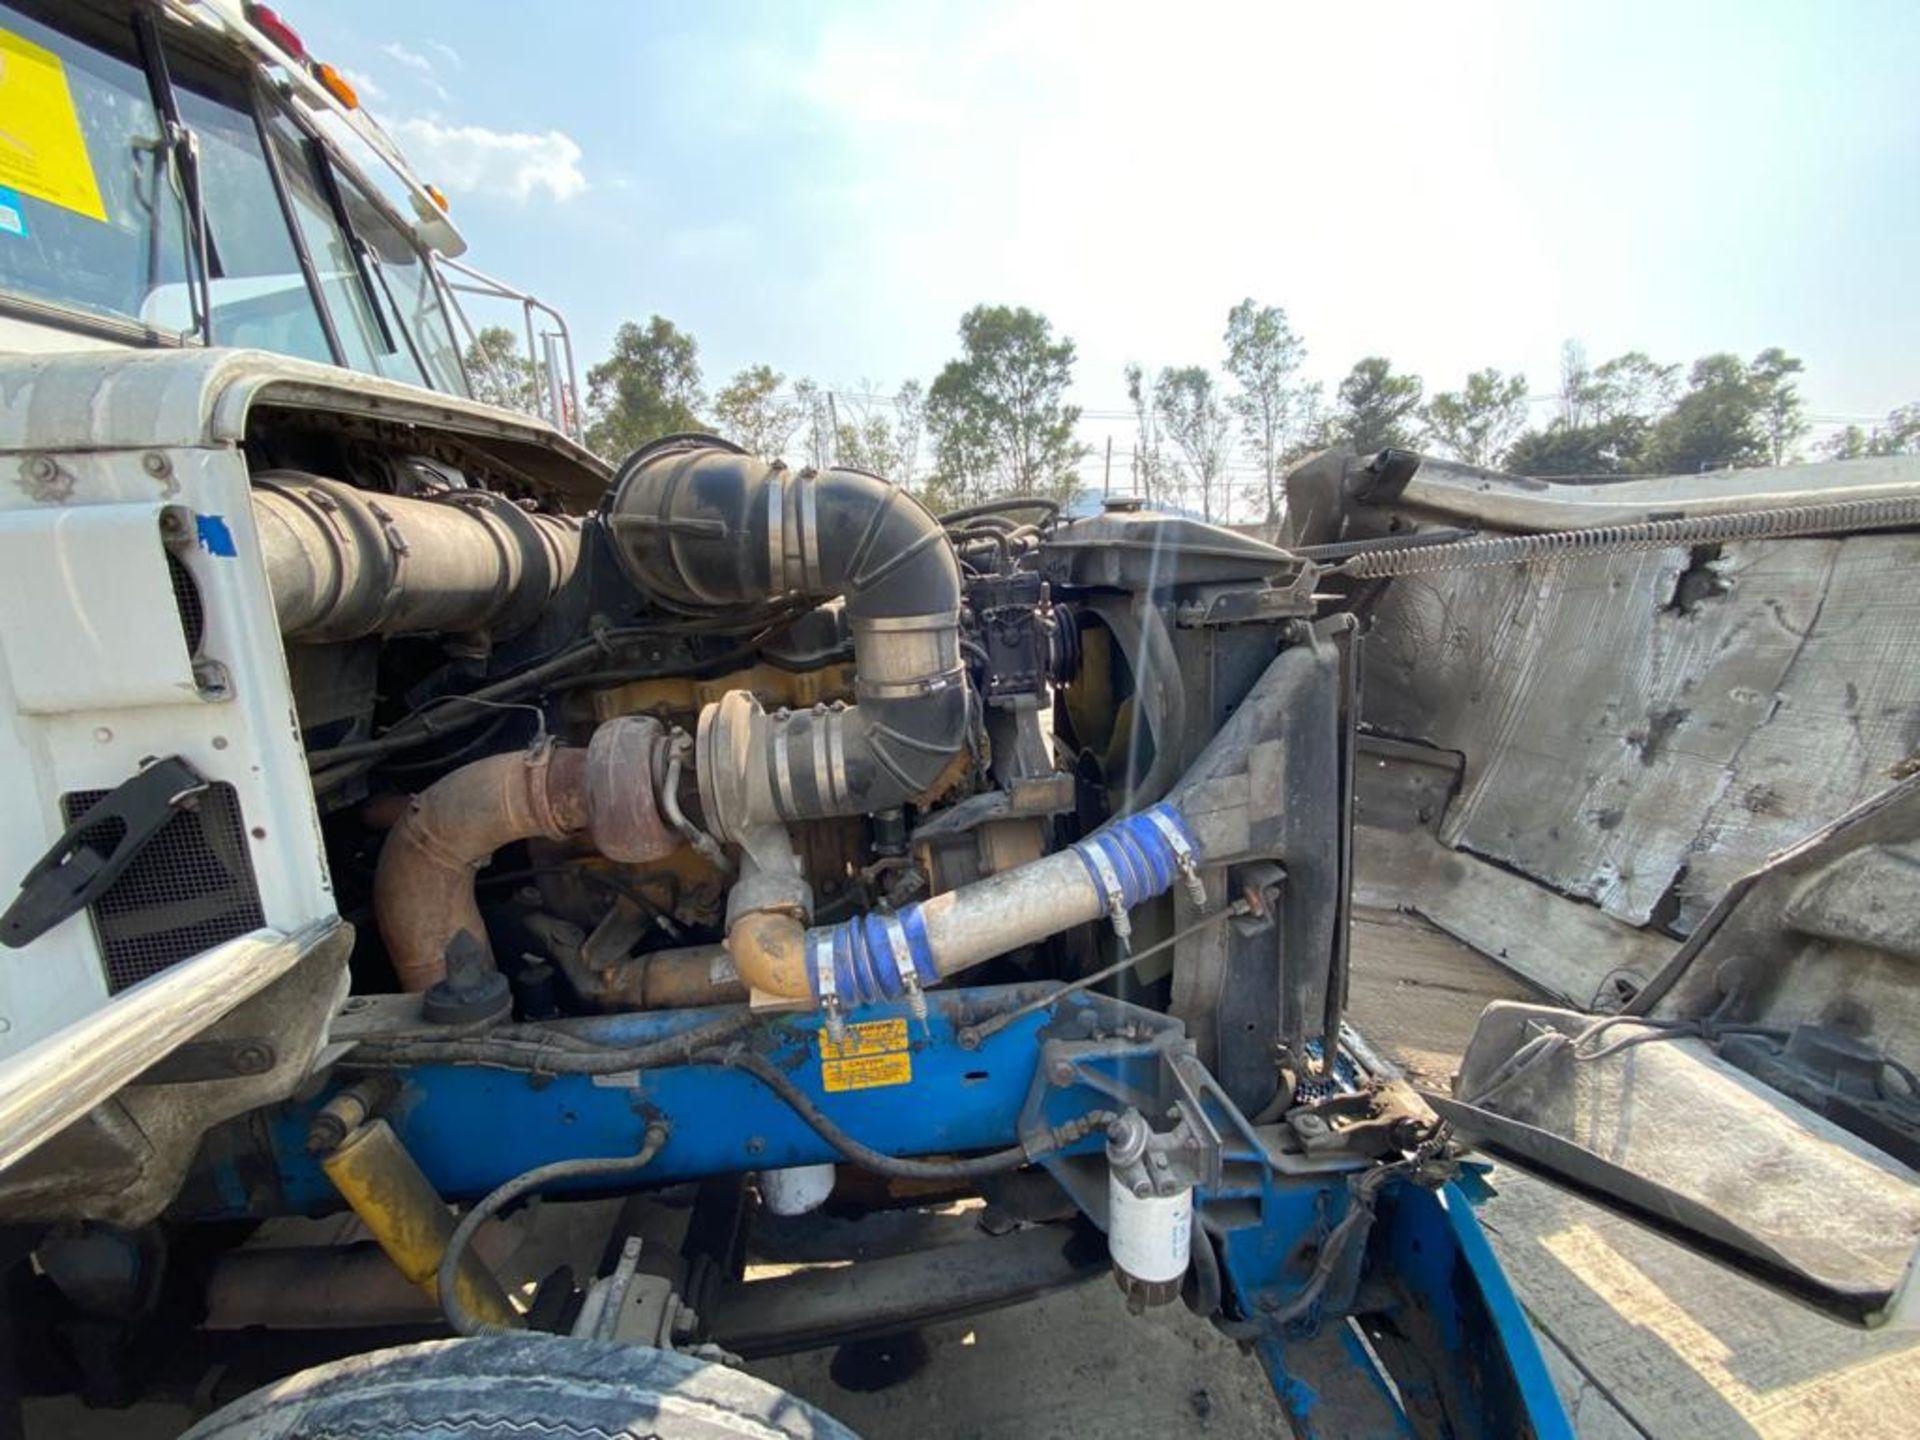 1999 Kenworth Sleeper truck tractor, standard transmission of 18 speeds - Image 72 of 75